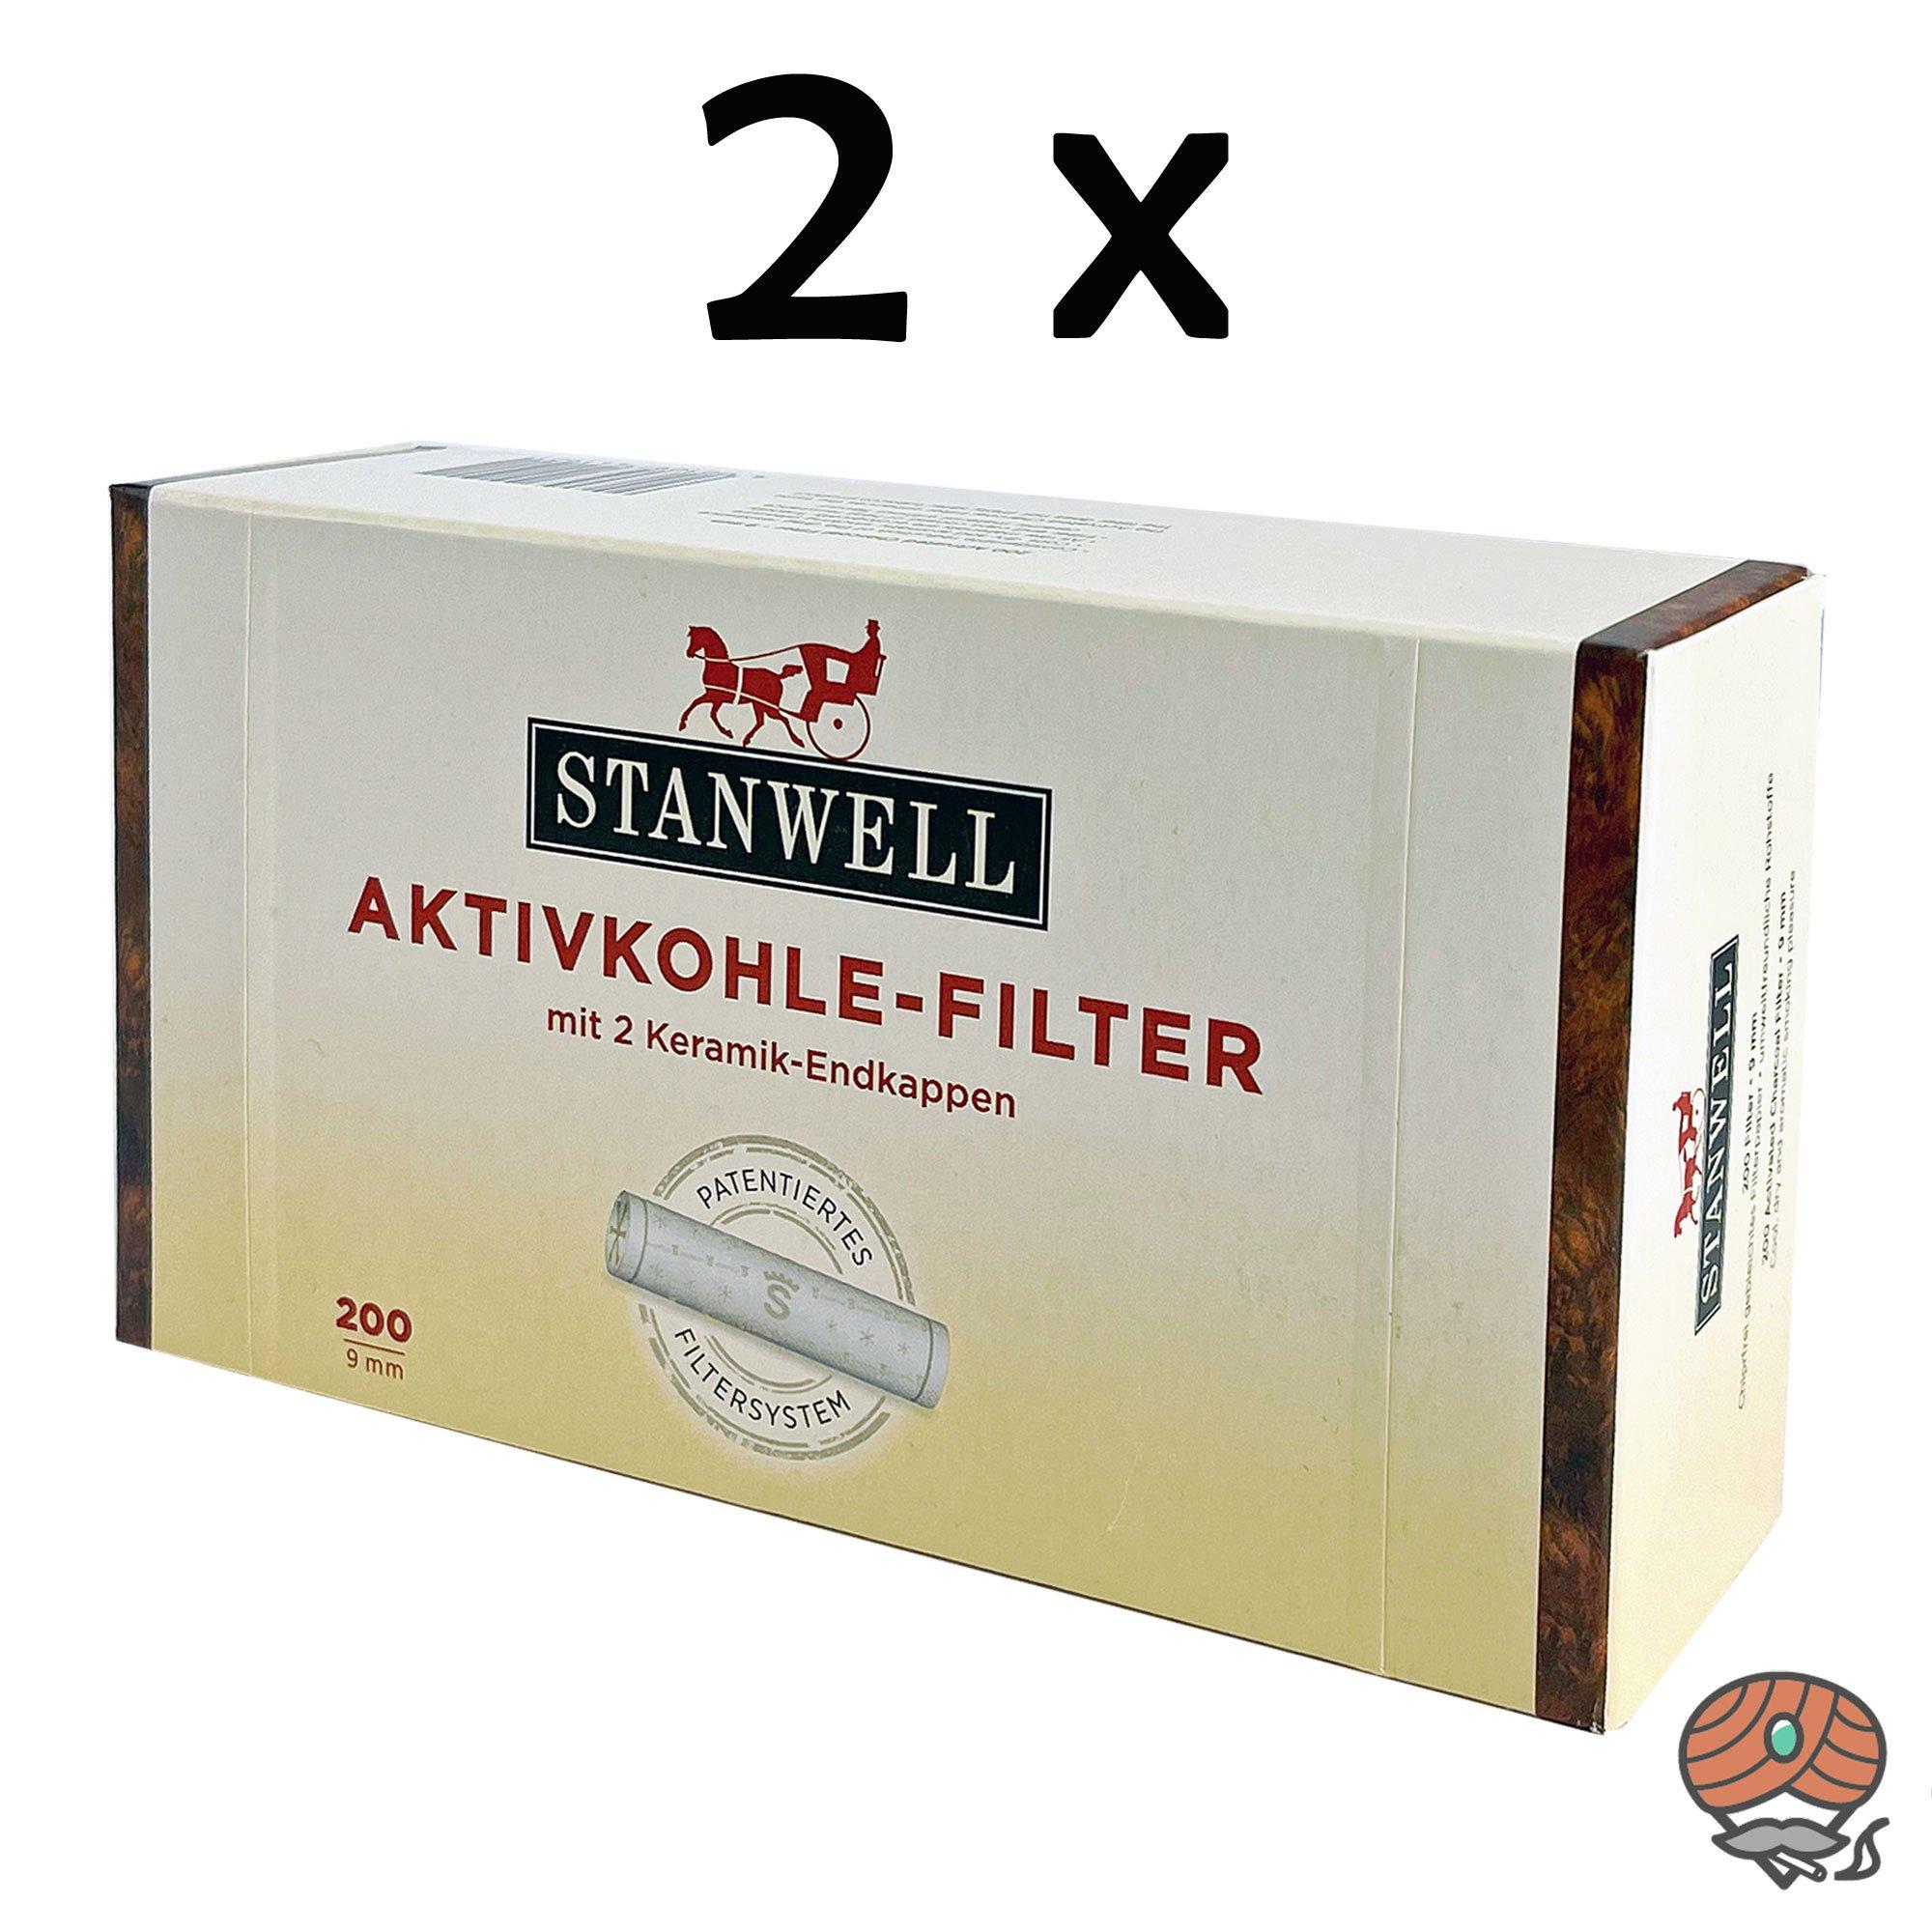 2x Stanwell Aktivkohle-Filter 9mm mit 2 Keramik-Endkappen à 200 Stück